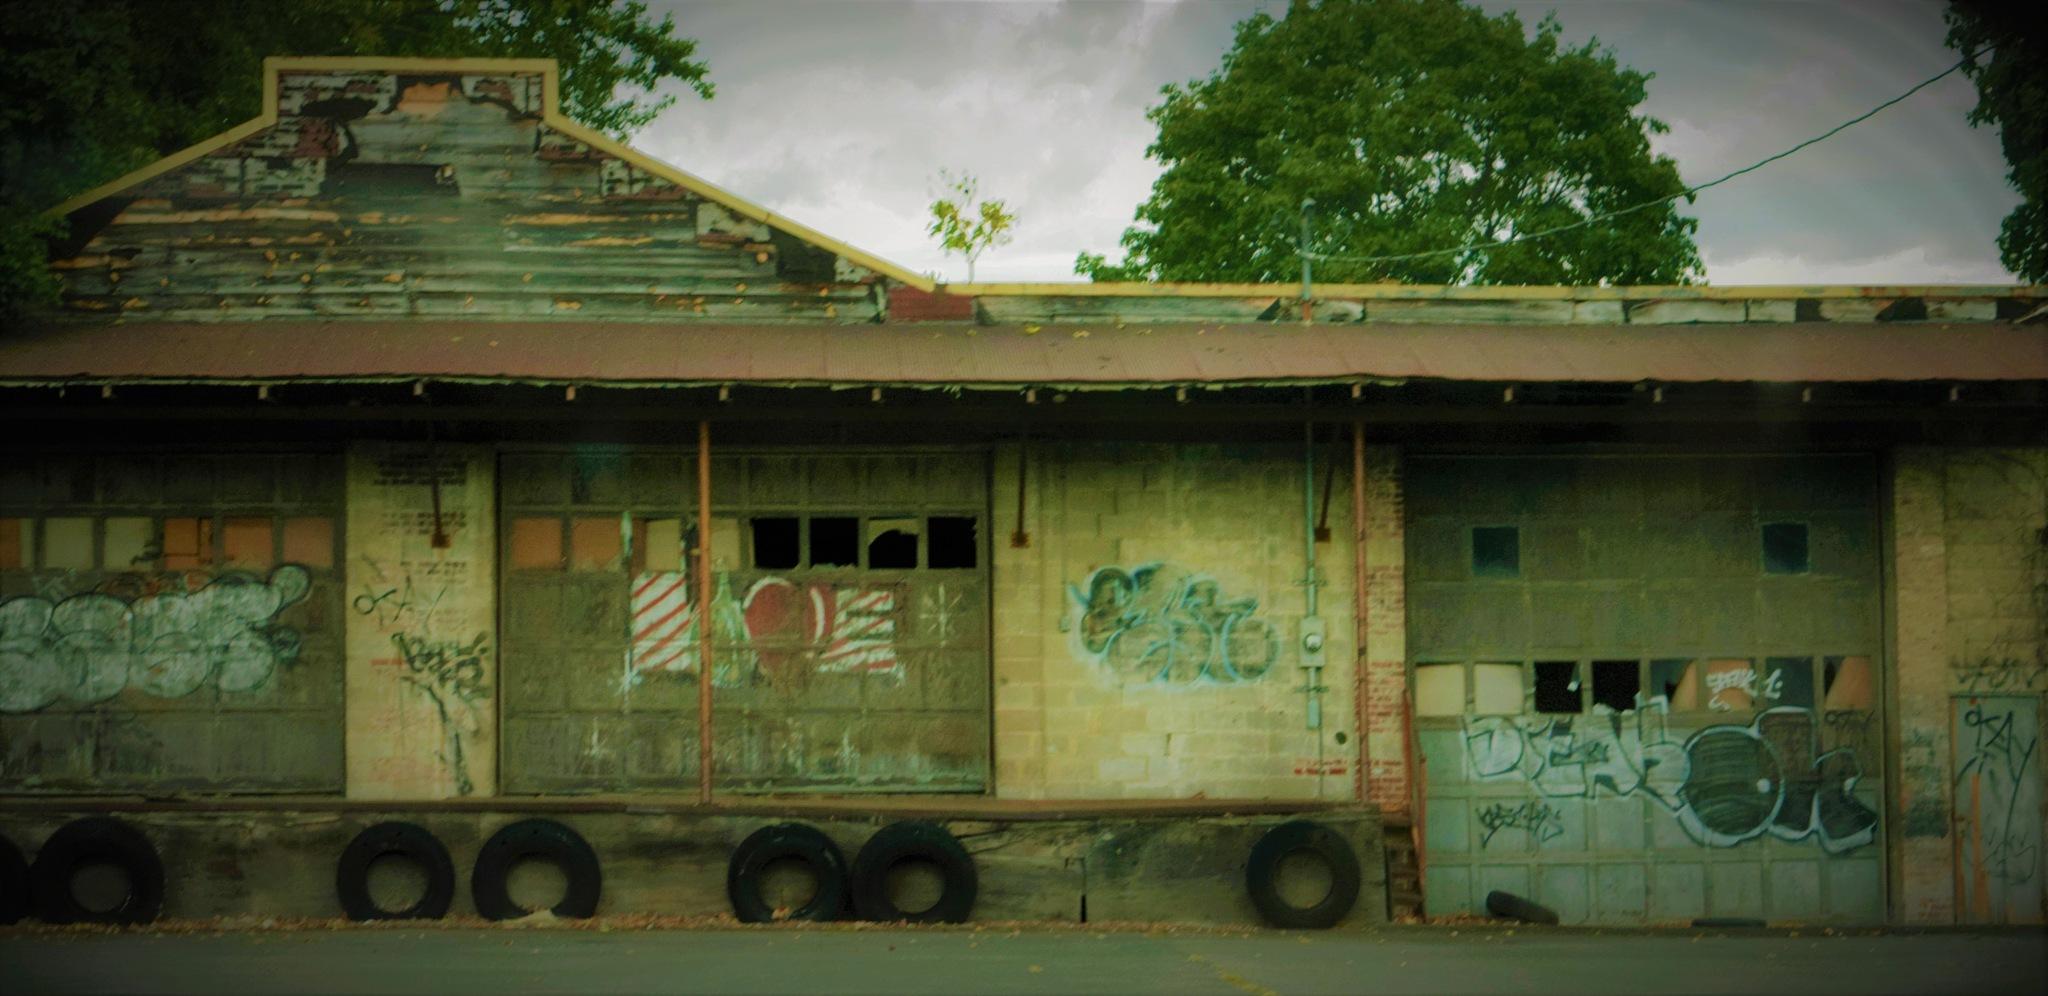 Industrial Strength Garage by RichardJTreitner